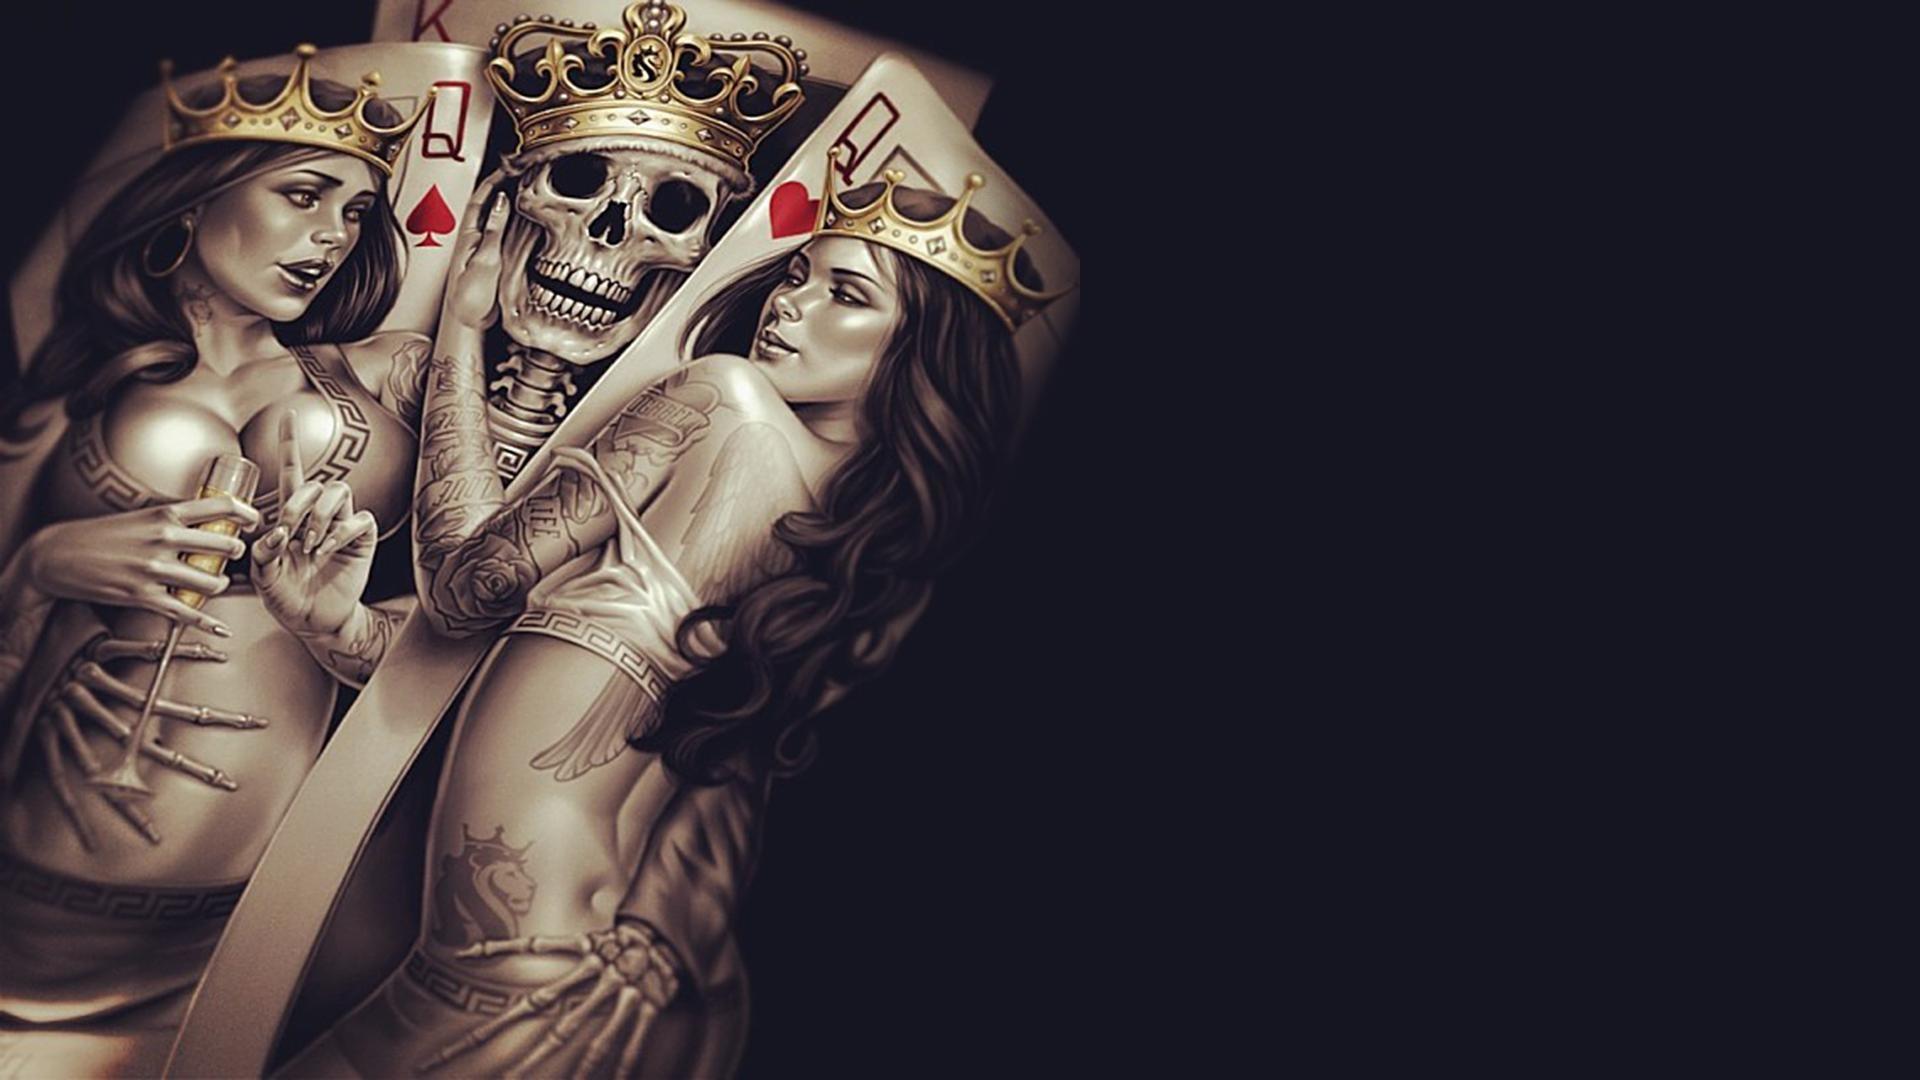 Skull-Find-best-latest-Skull-in-HD-for-